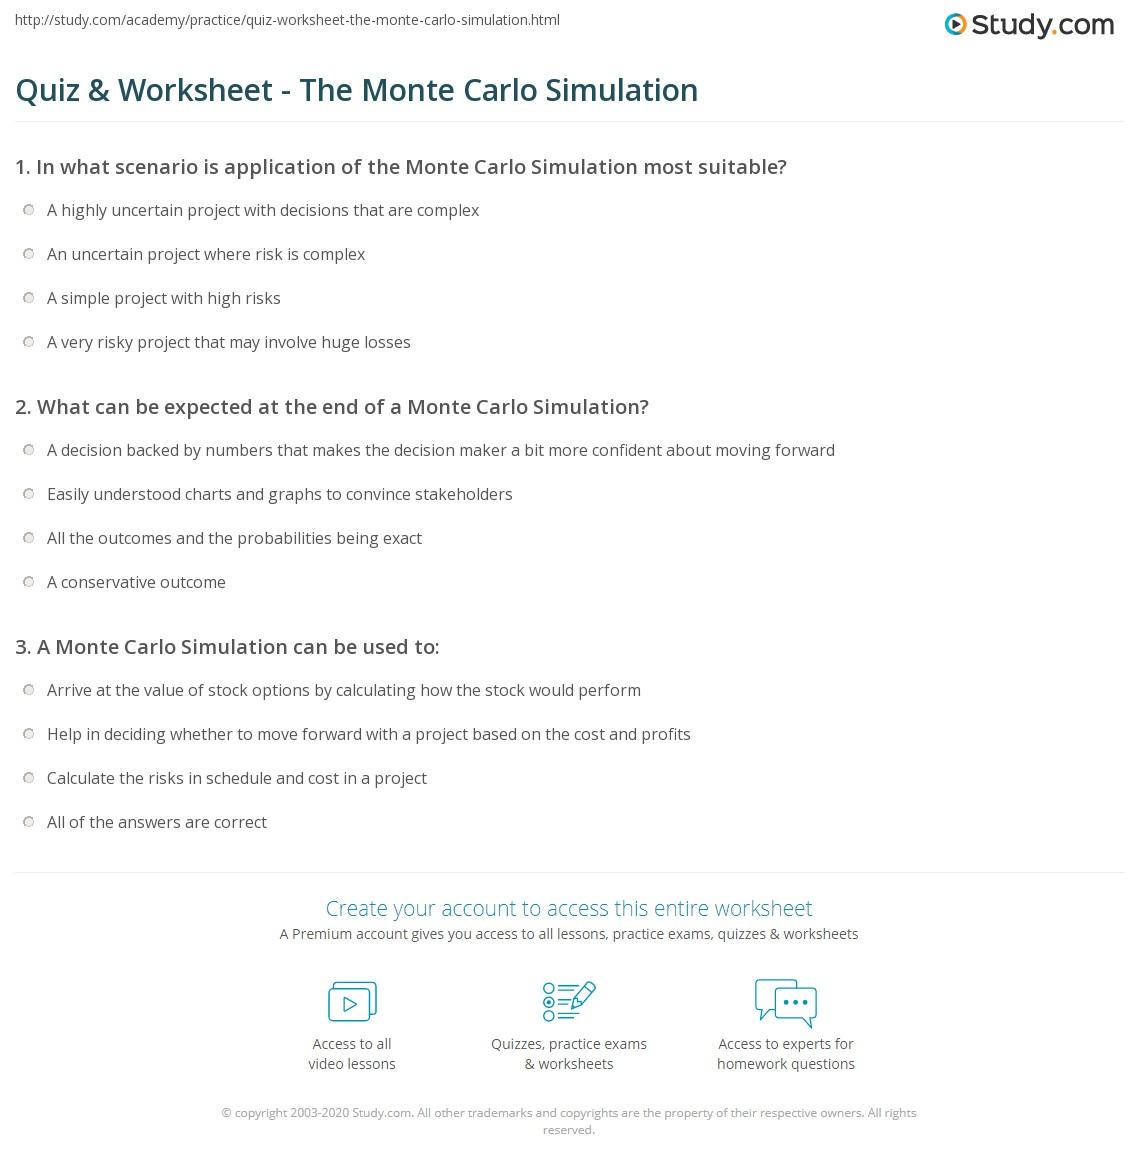 Quiz & Worksheet - The Monte Carlo Simulation | Study com